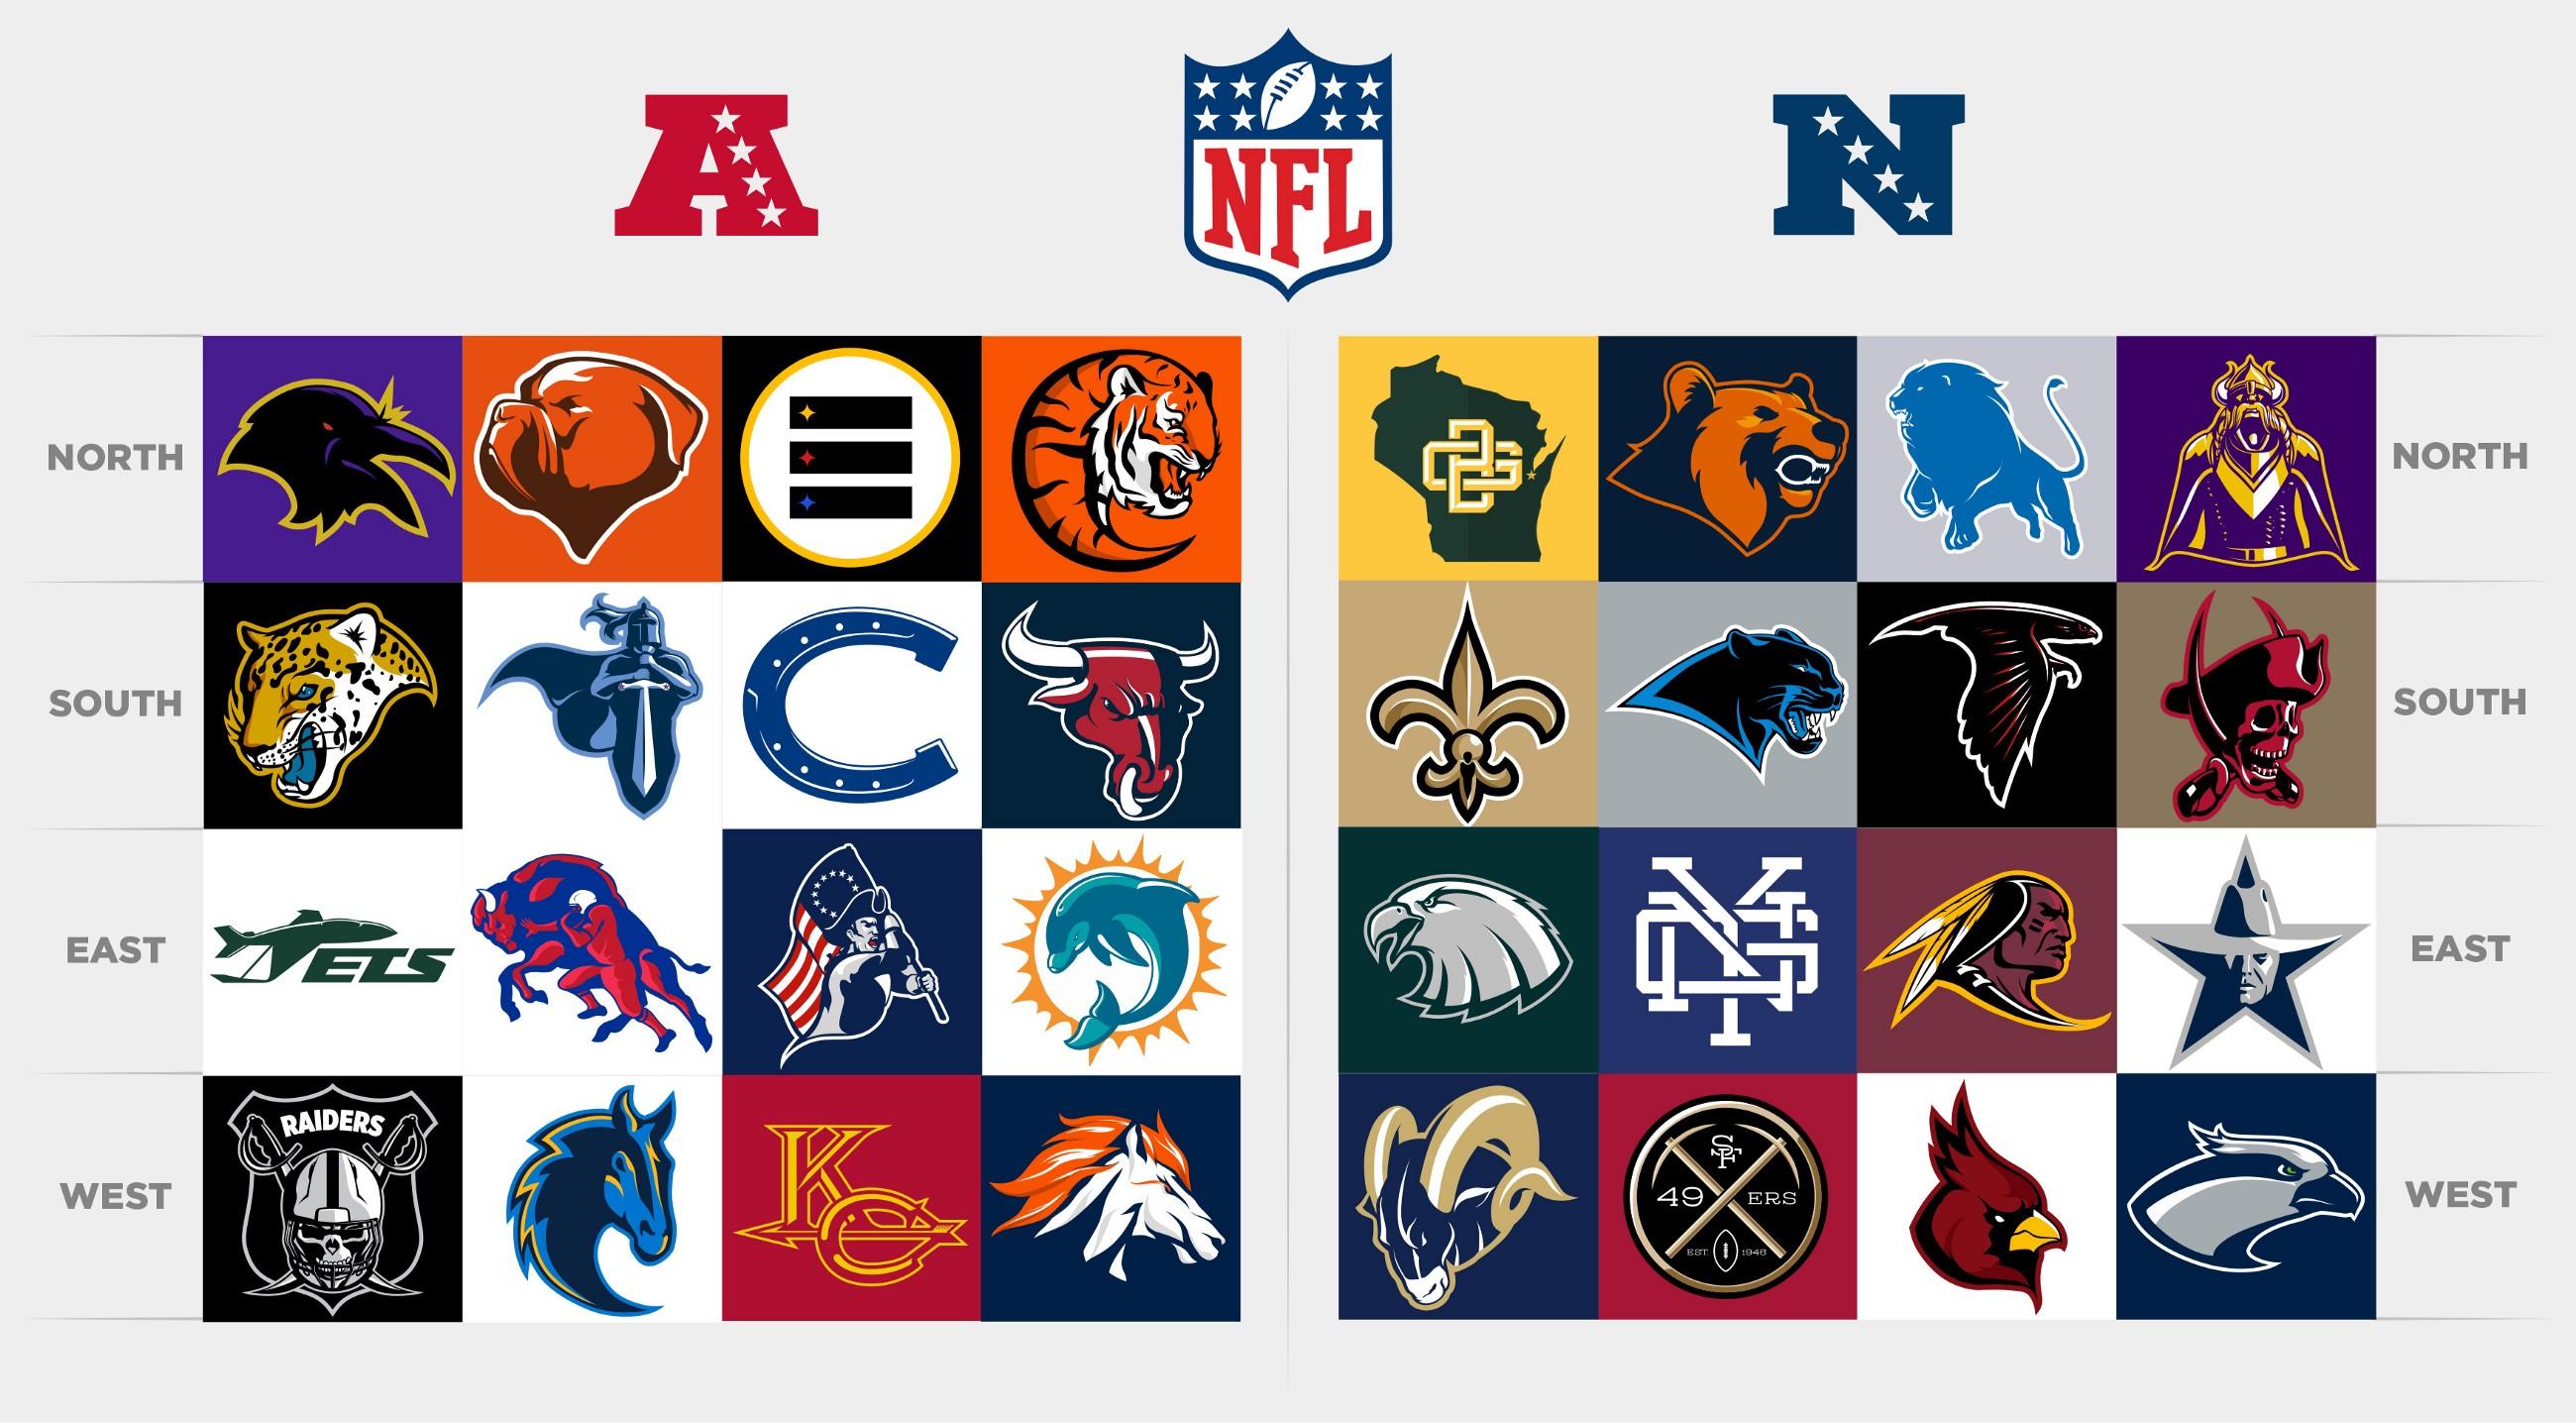 Ranking NFL Teams Using Maximum Likelihood Estimation - By